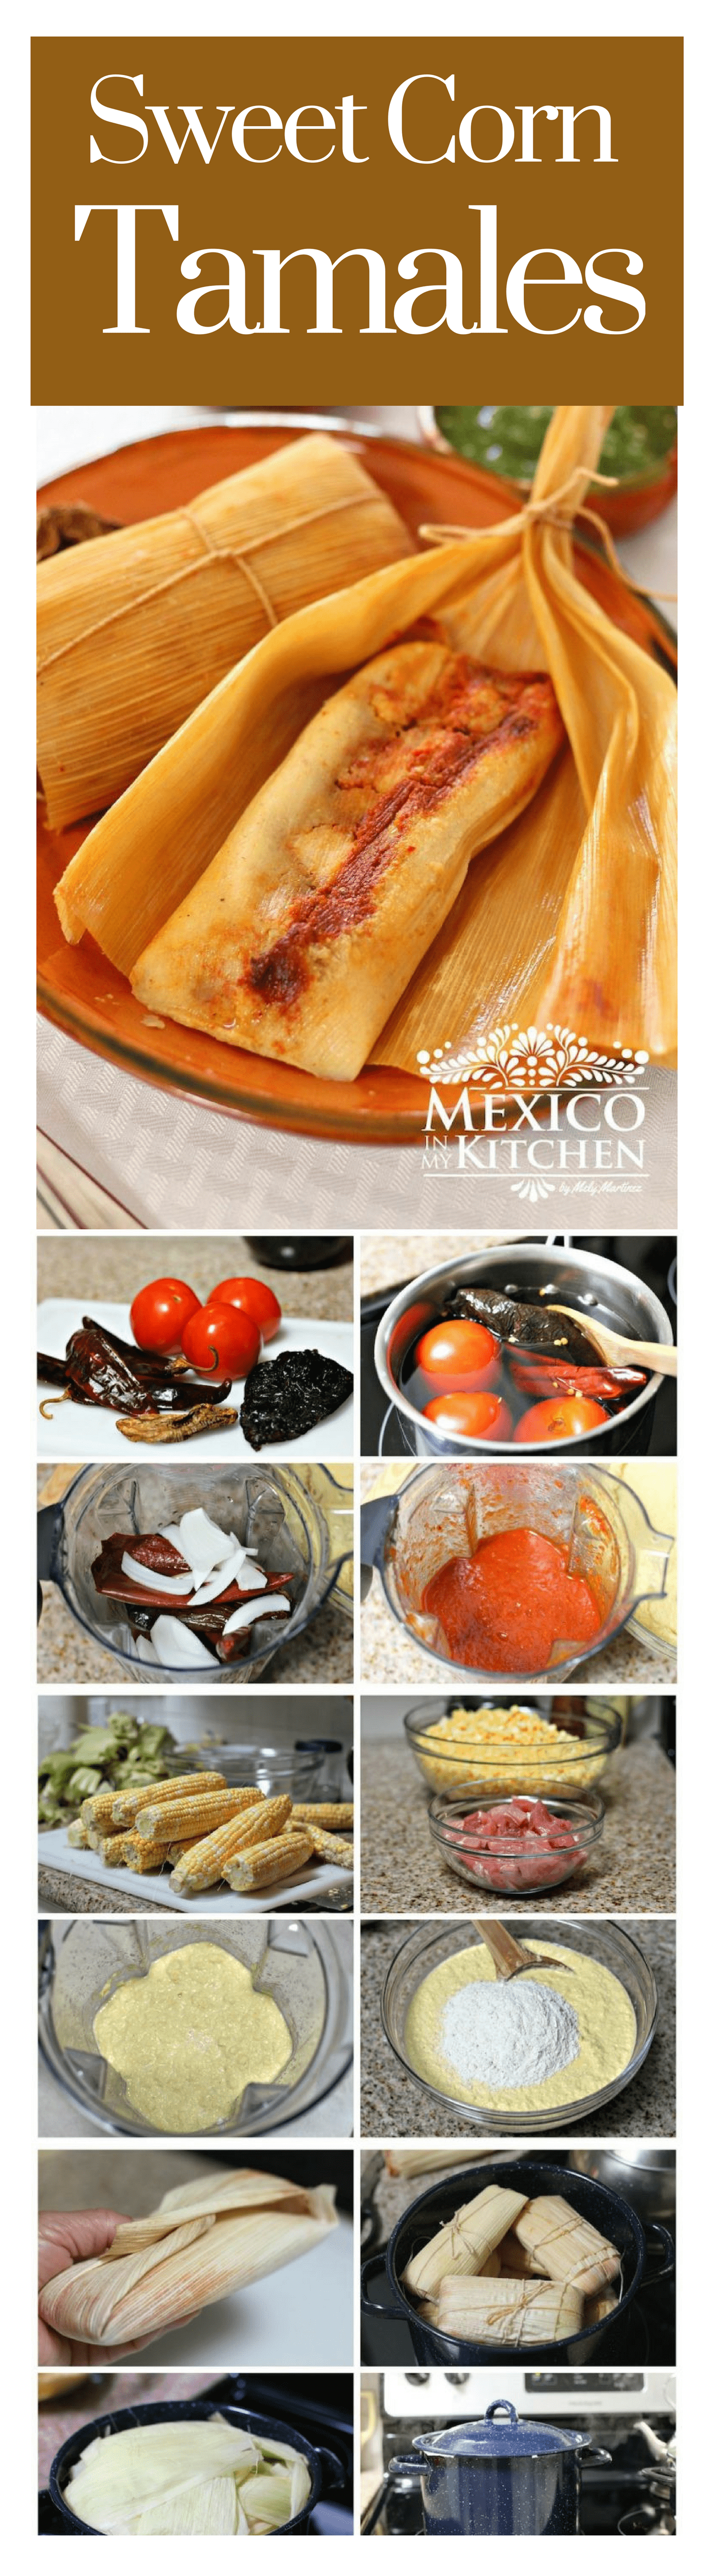 Sweet corn tamales Recipe Corn tamales, Mexican food